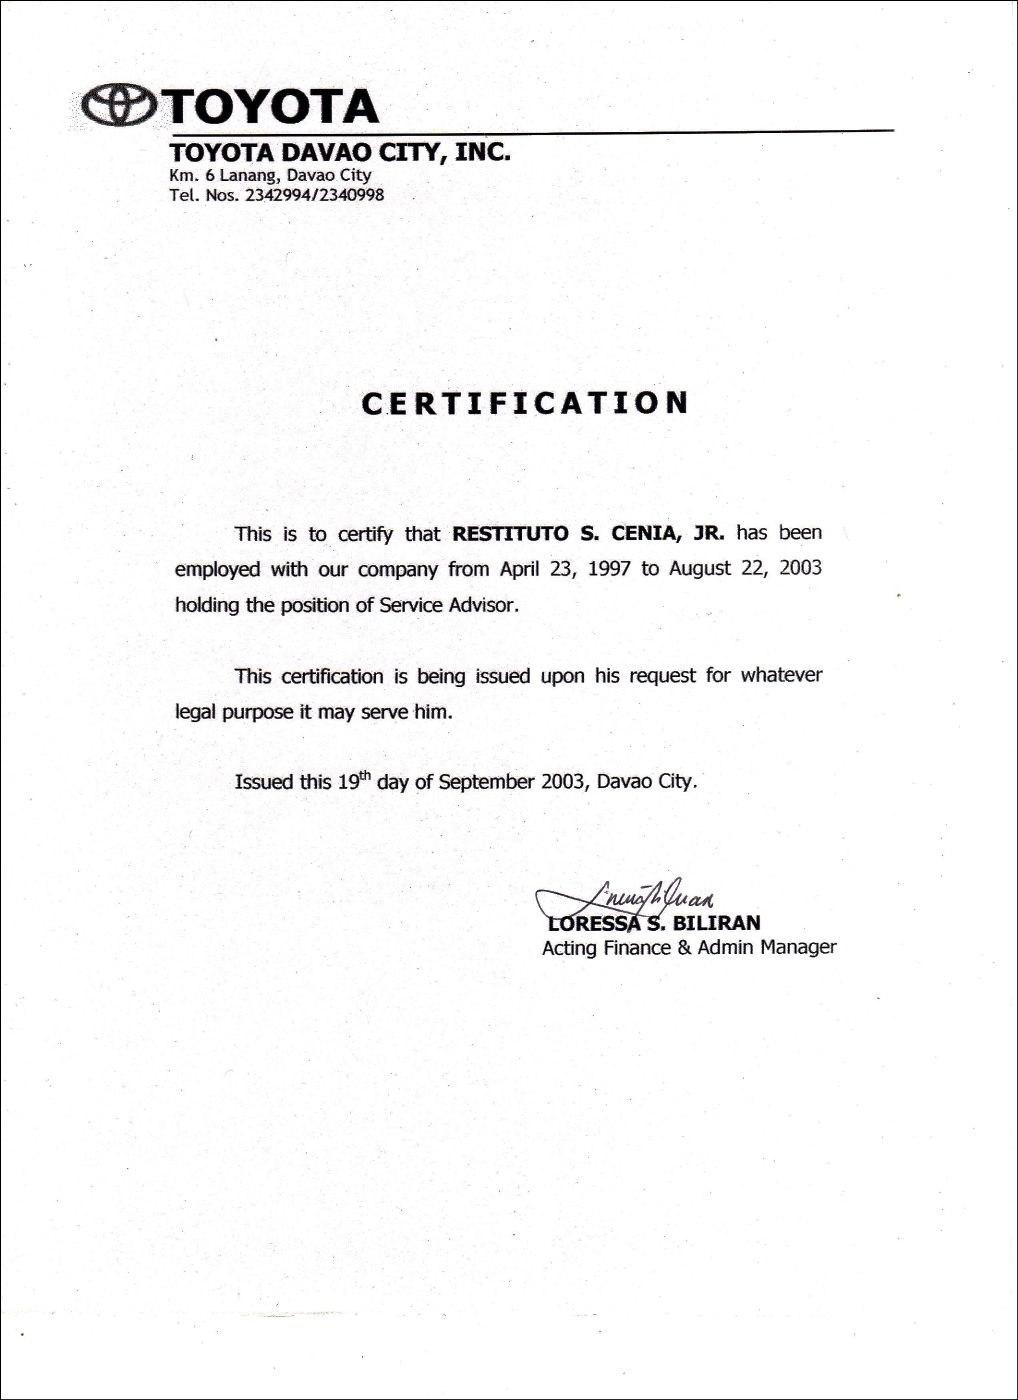 Employment Certificate Sample Best Templates Pinterest Marriage Inside Certificate Of Employment Template